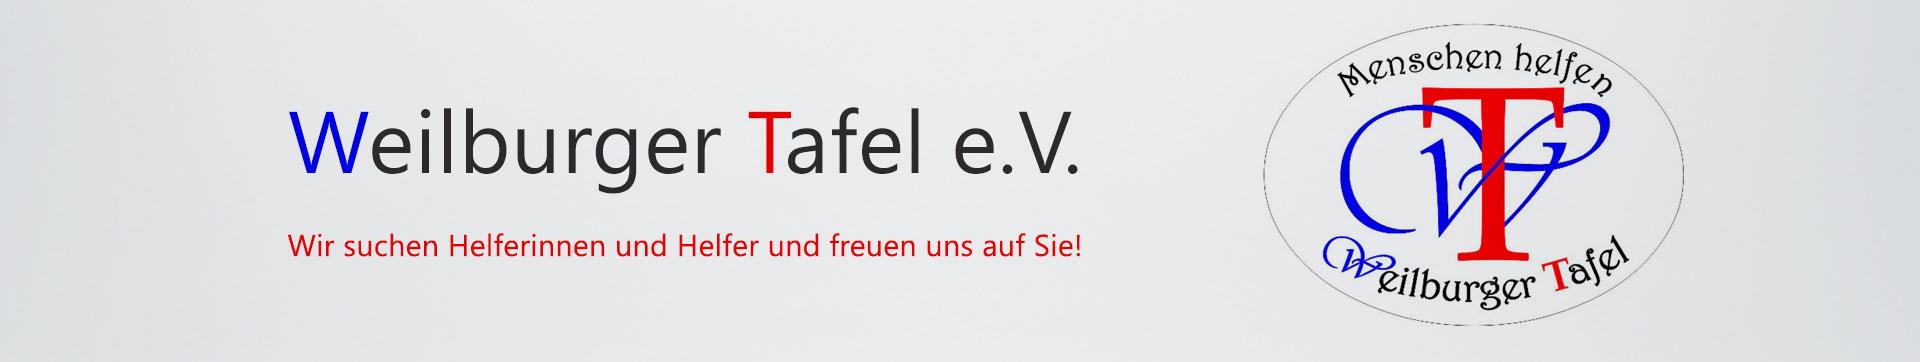 weilburger tafel case study